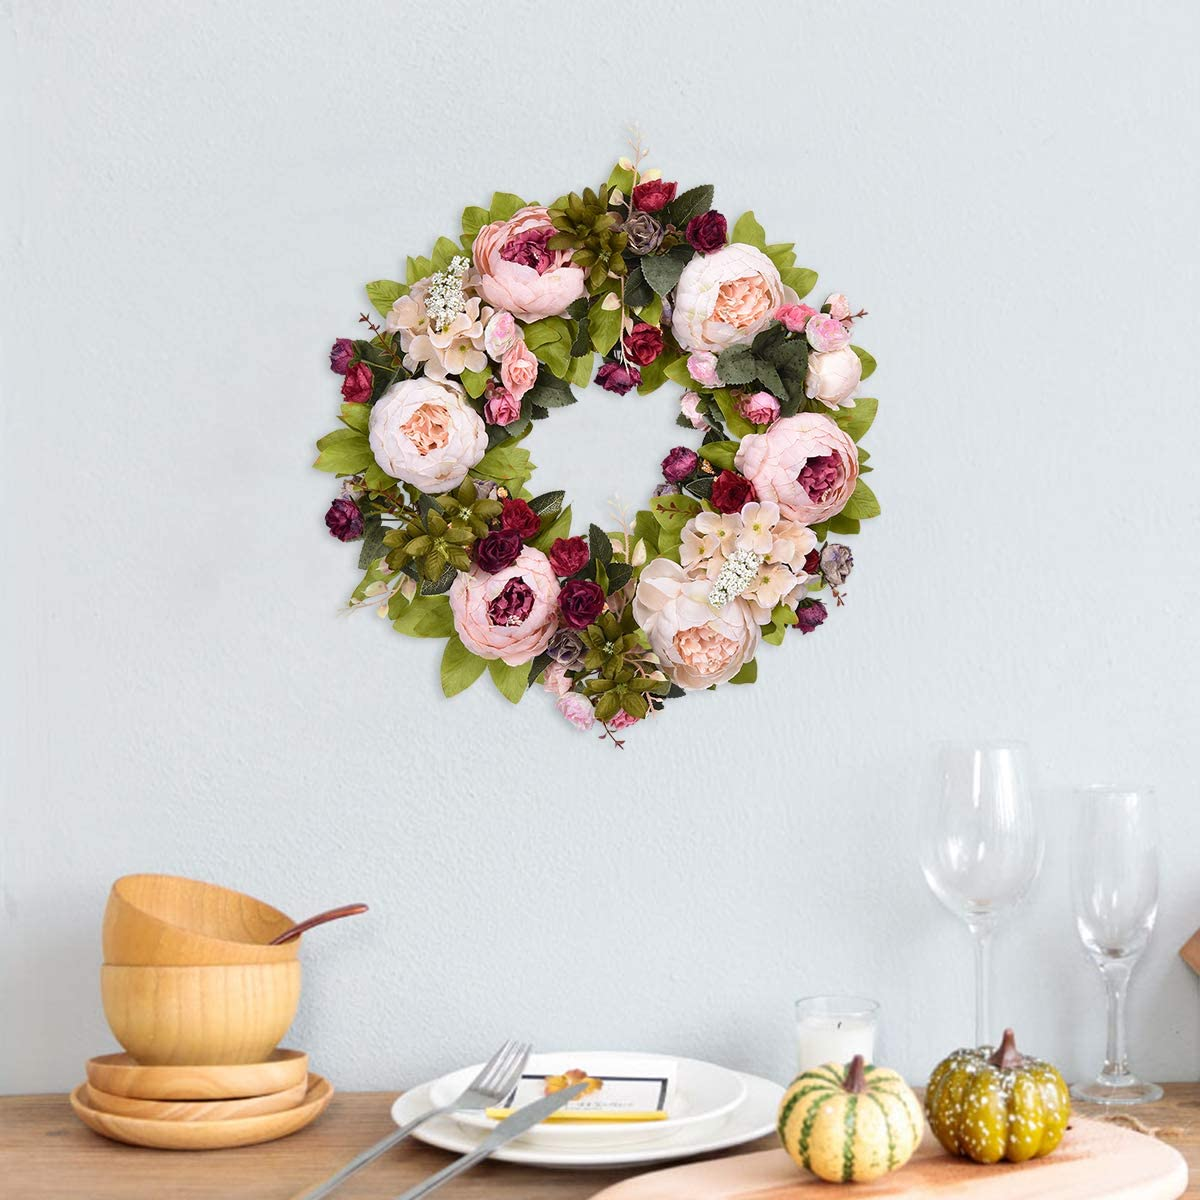 Sunm Boutique Artificial Peony Flower Wreath, 15.7